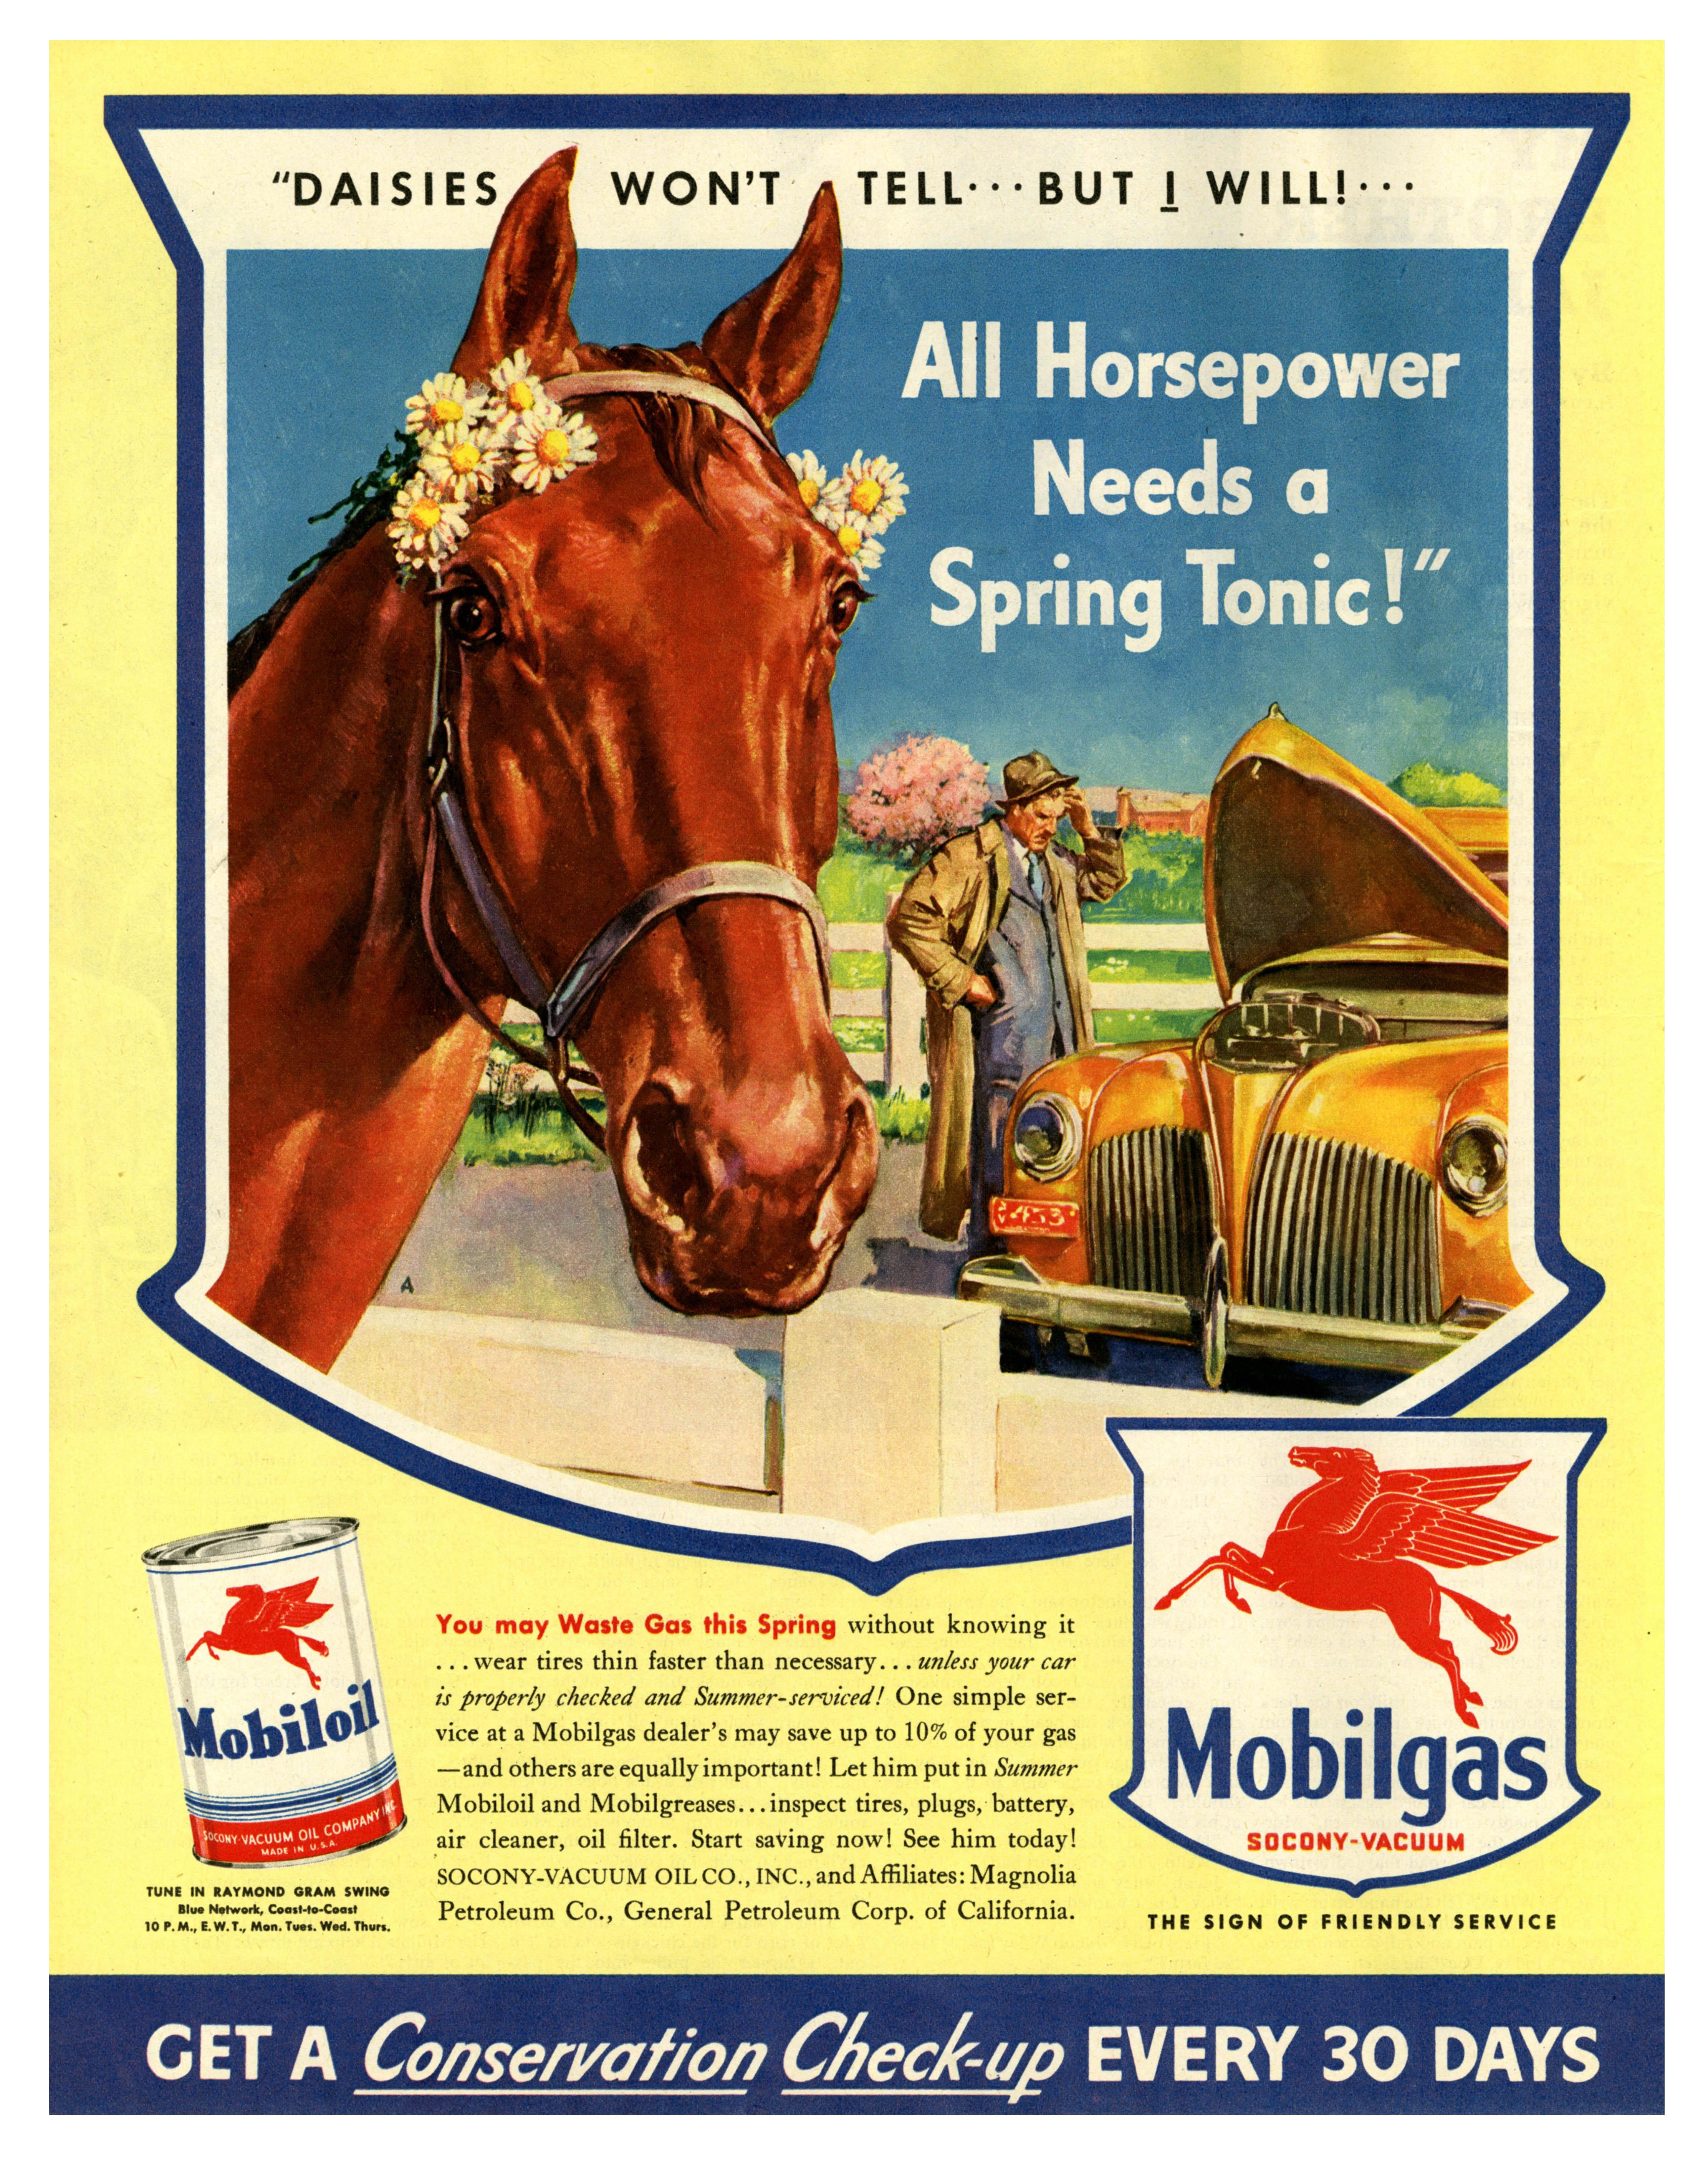 Mobilgas/Mobiloil - 1943